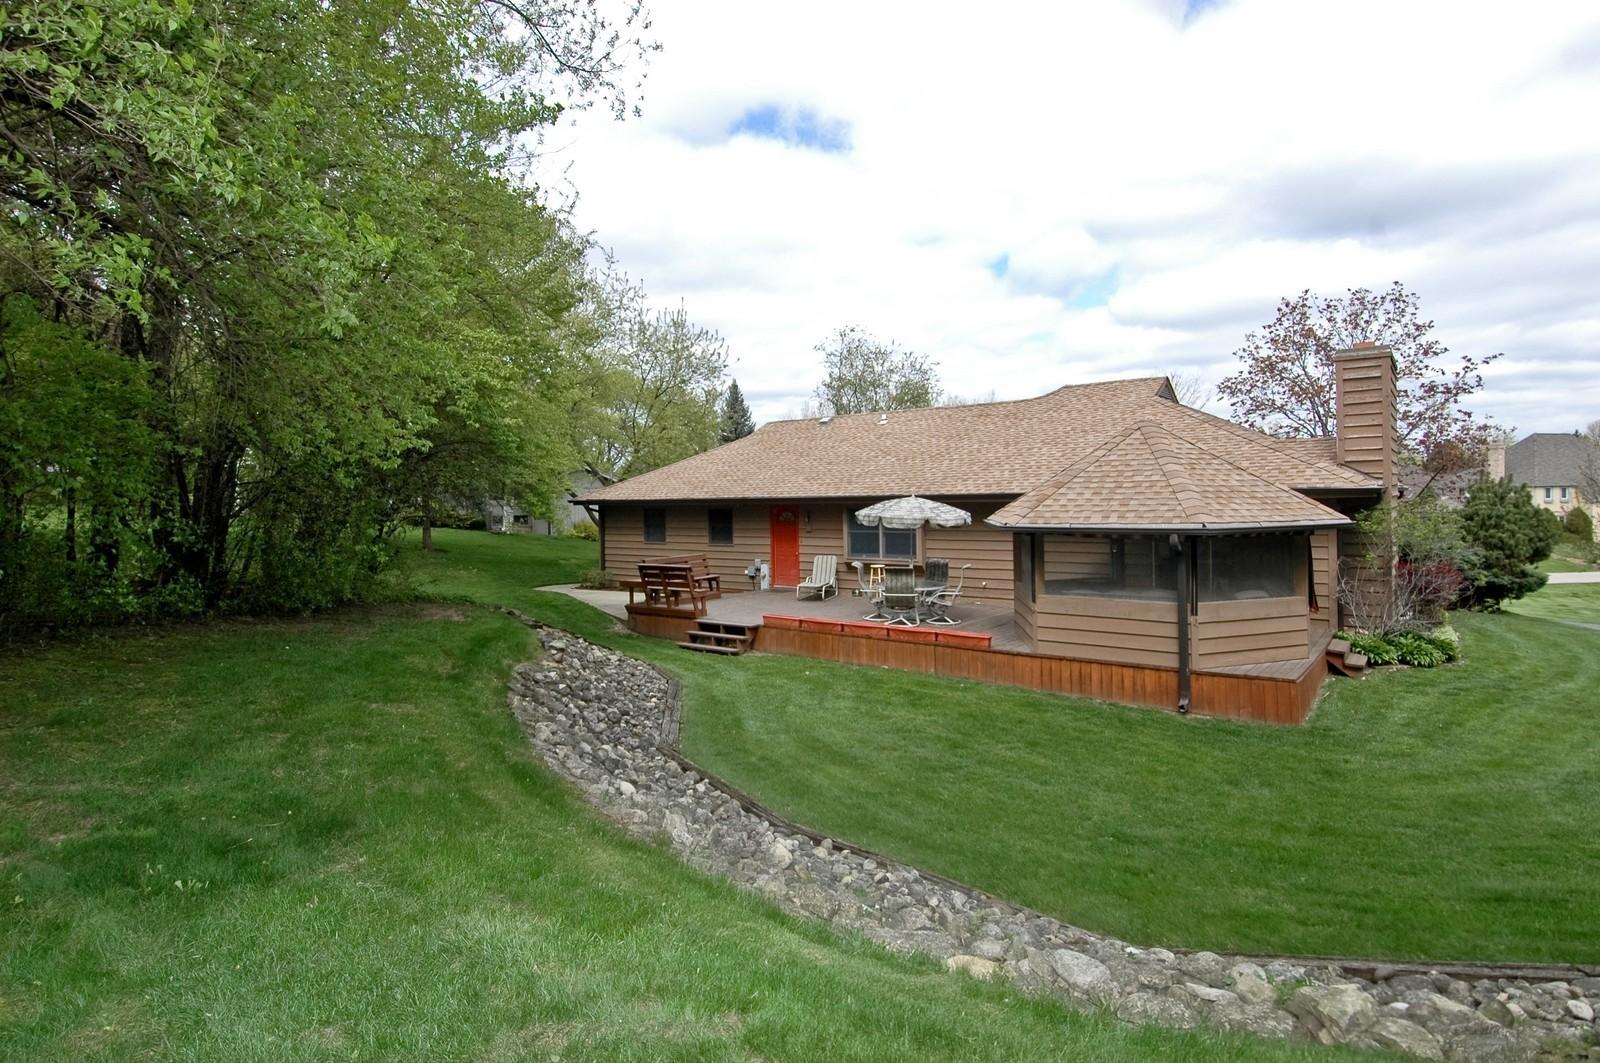 Real Estate Photography - 4409 Nancy, Crystal Lake, IL, 60014 - Rear View